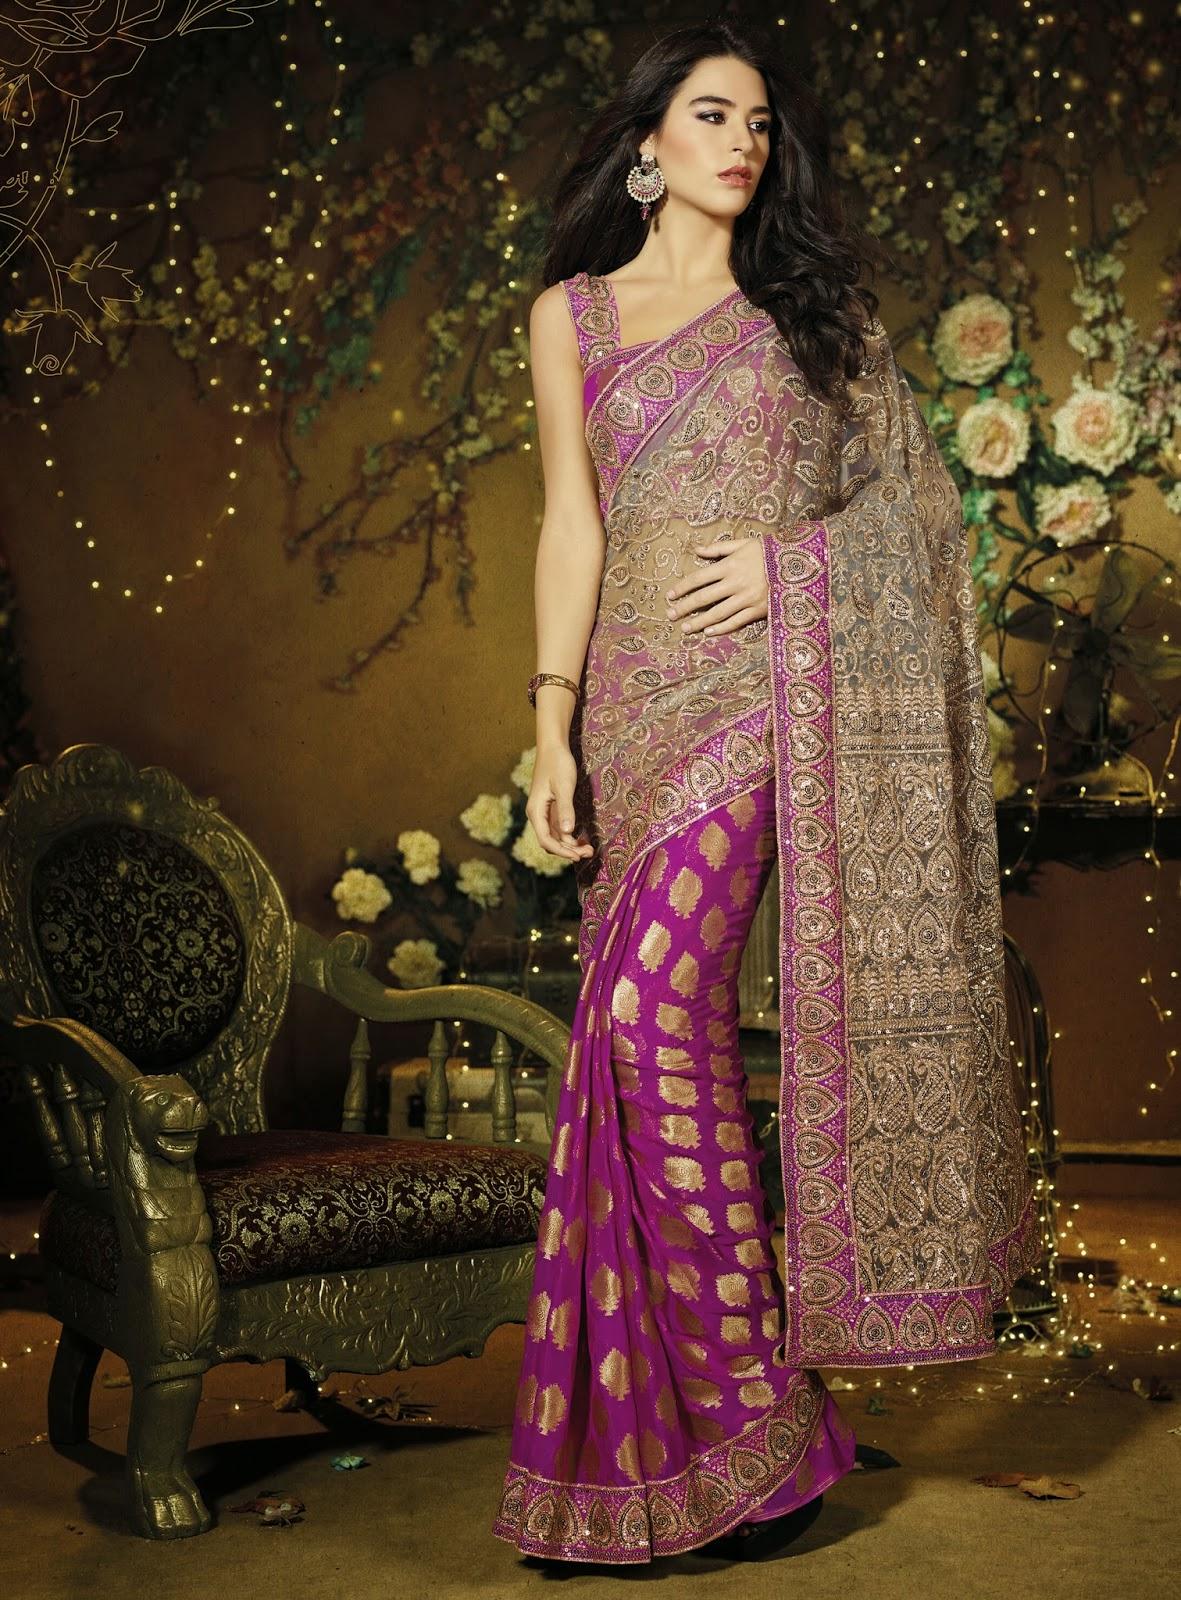 designer sarees images festive season saree collection. Black Bedroom Furniture Sets. Home Design Ideas